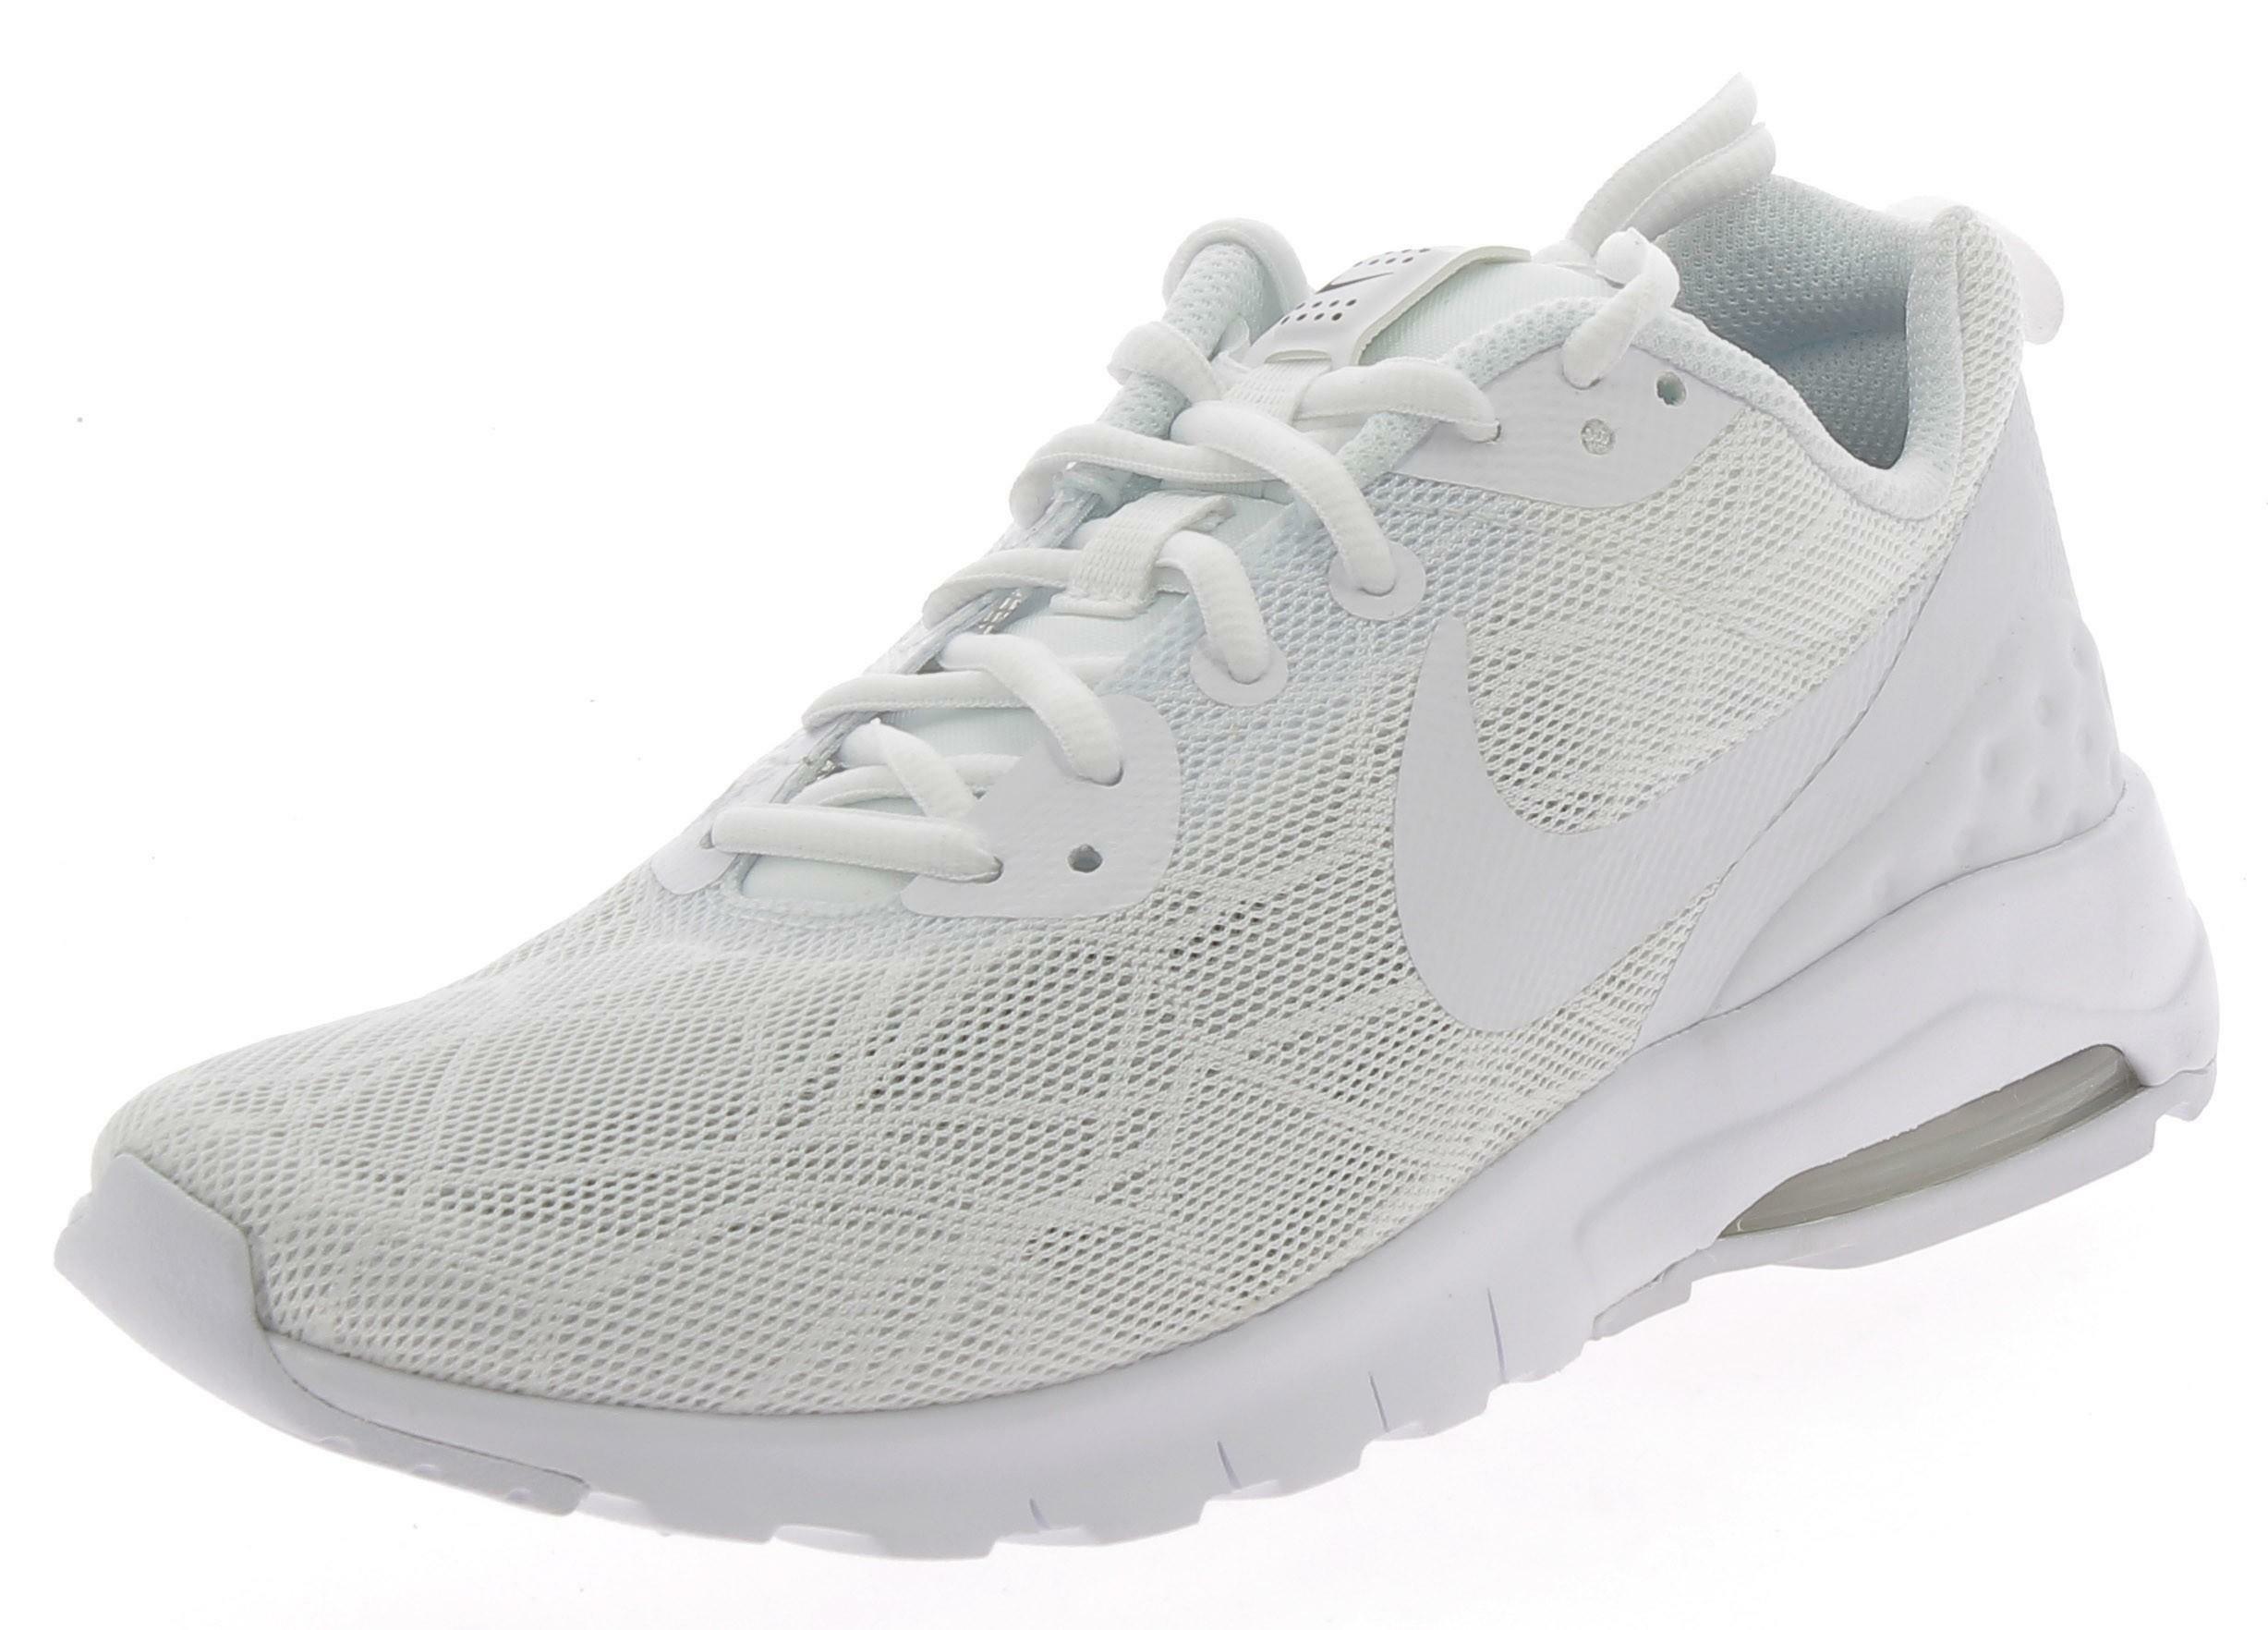 separation shoes 0a754 9d084 Nike Air Max Motion LW SE Scarpe Sportive Donna Bianche 844895101